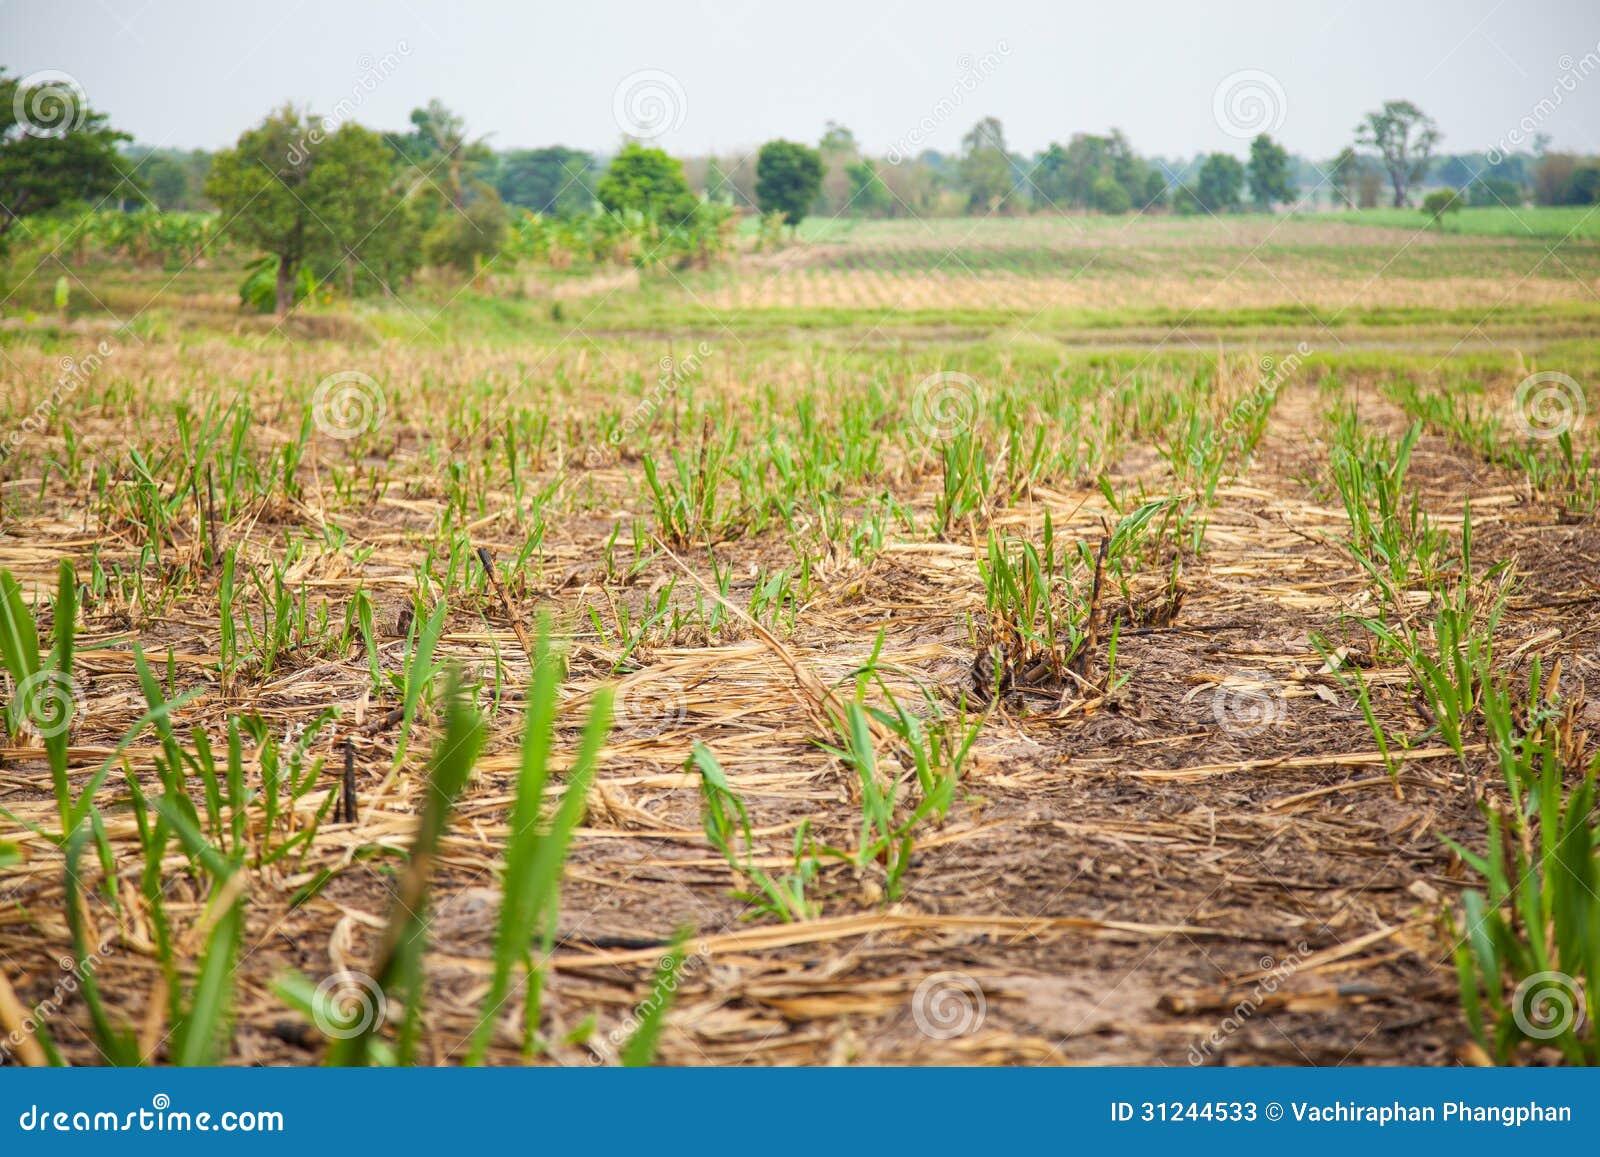 sugarcane farming business plan pdf